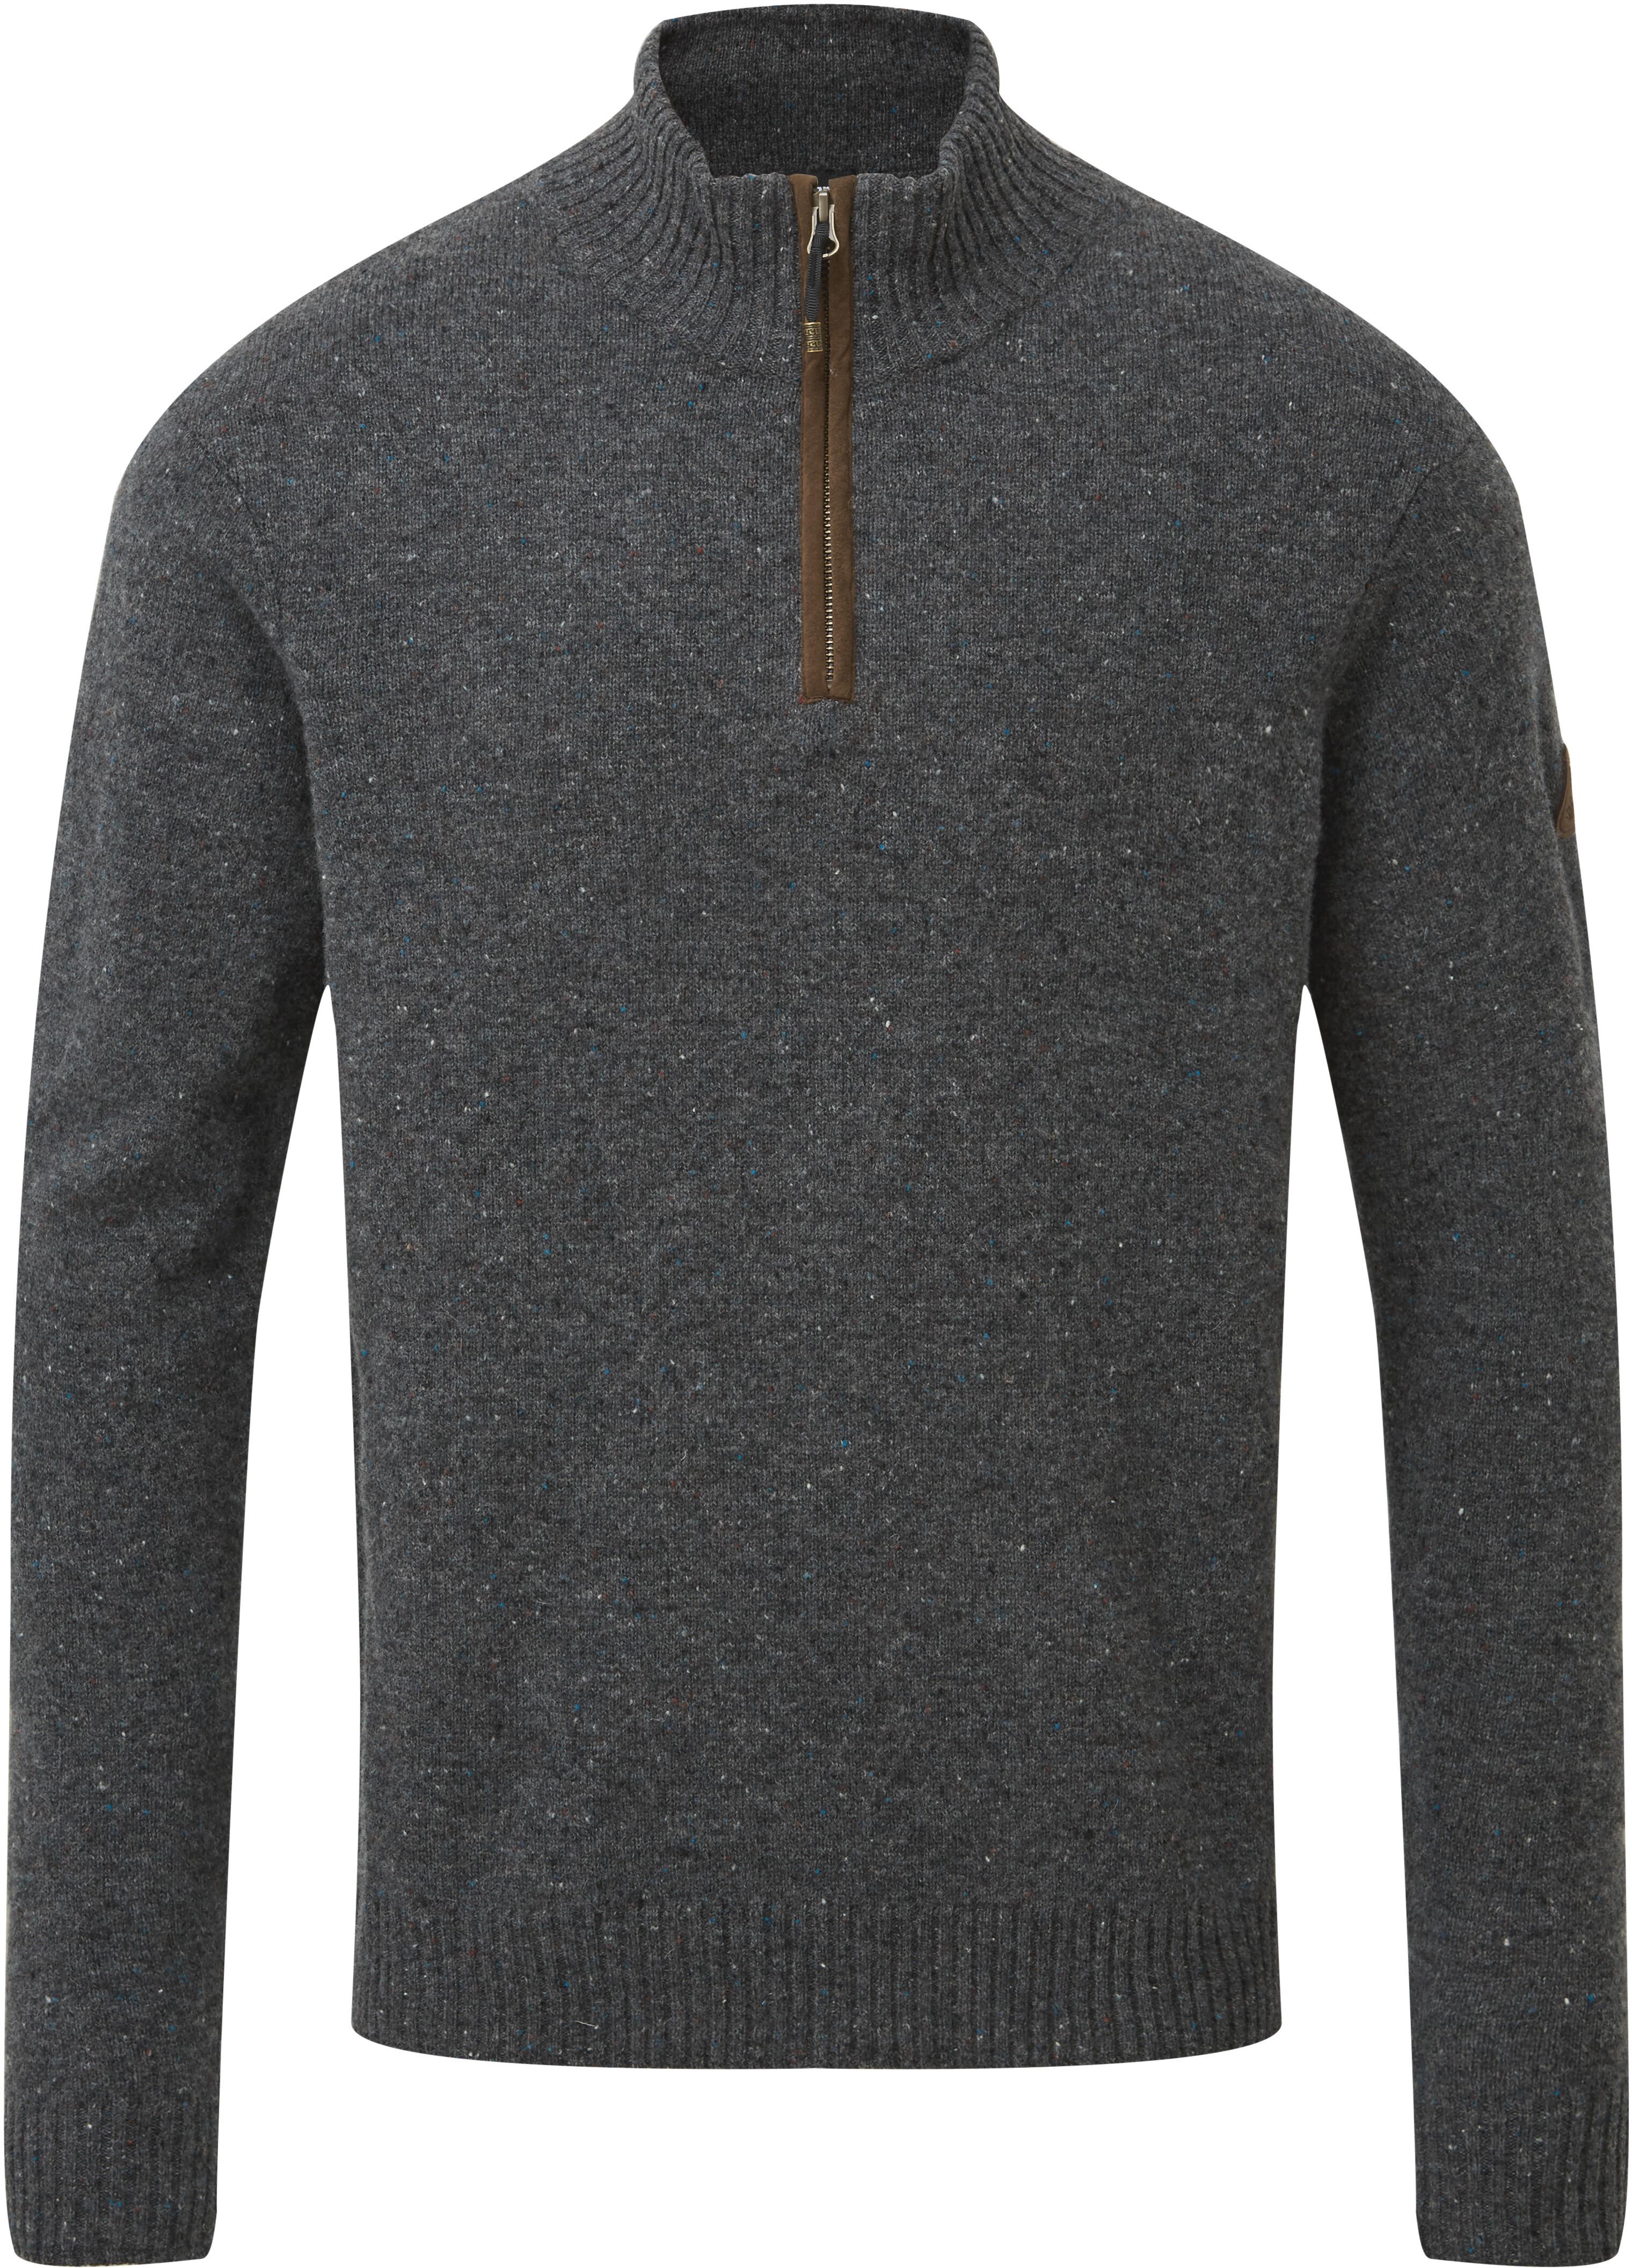 Sherpa Adventure Gear Mens Kangtega Quarter Zip Sweater 100/% fine Merino wool